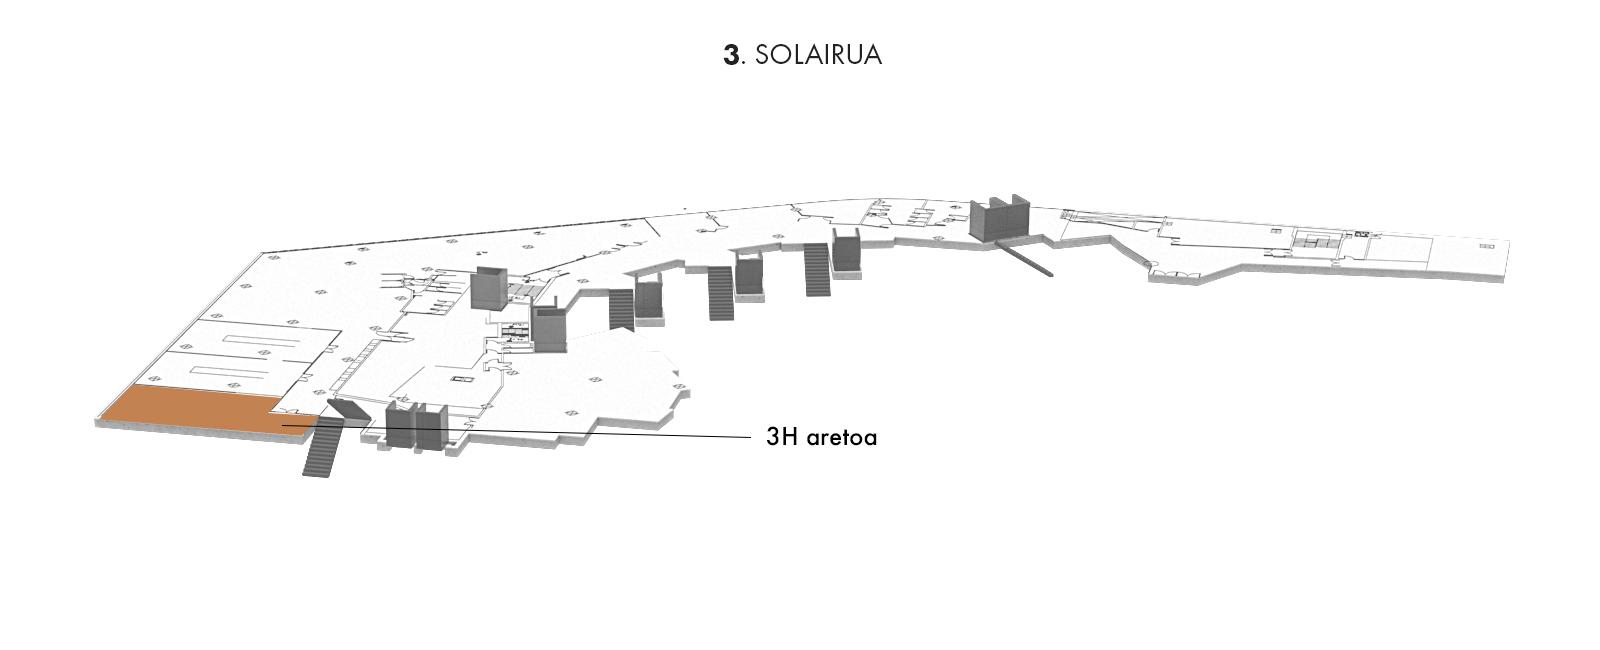 3H aretoa, 3. solairua   Palacio Euskalduna Jauregia